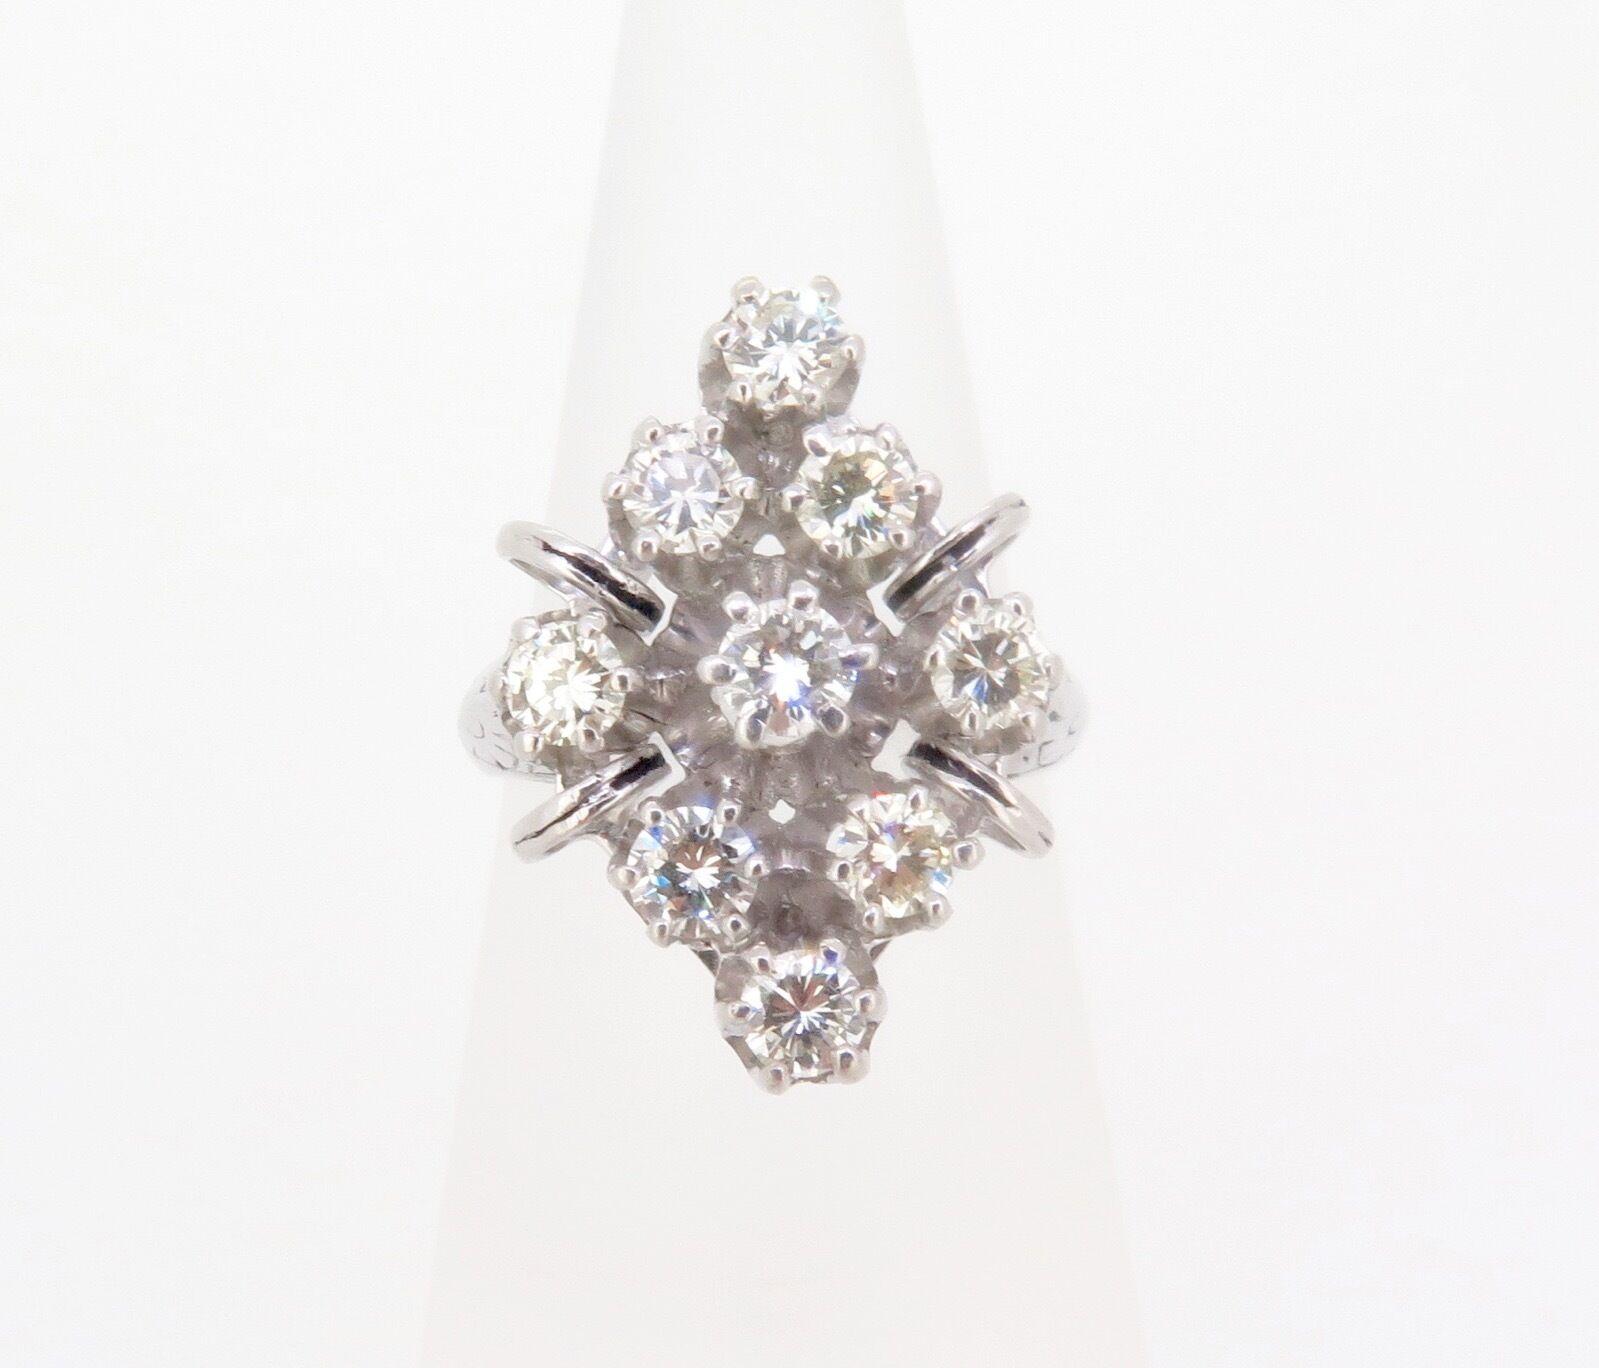 .Vintage ladies 14k gold 1.17ct VS diamond cluster dress ring Val  5190